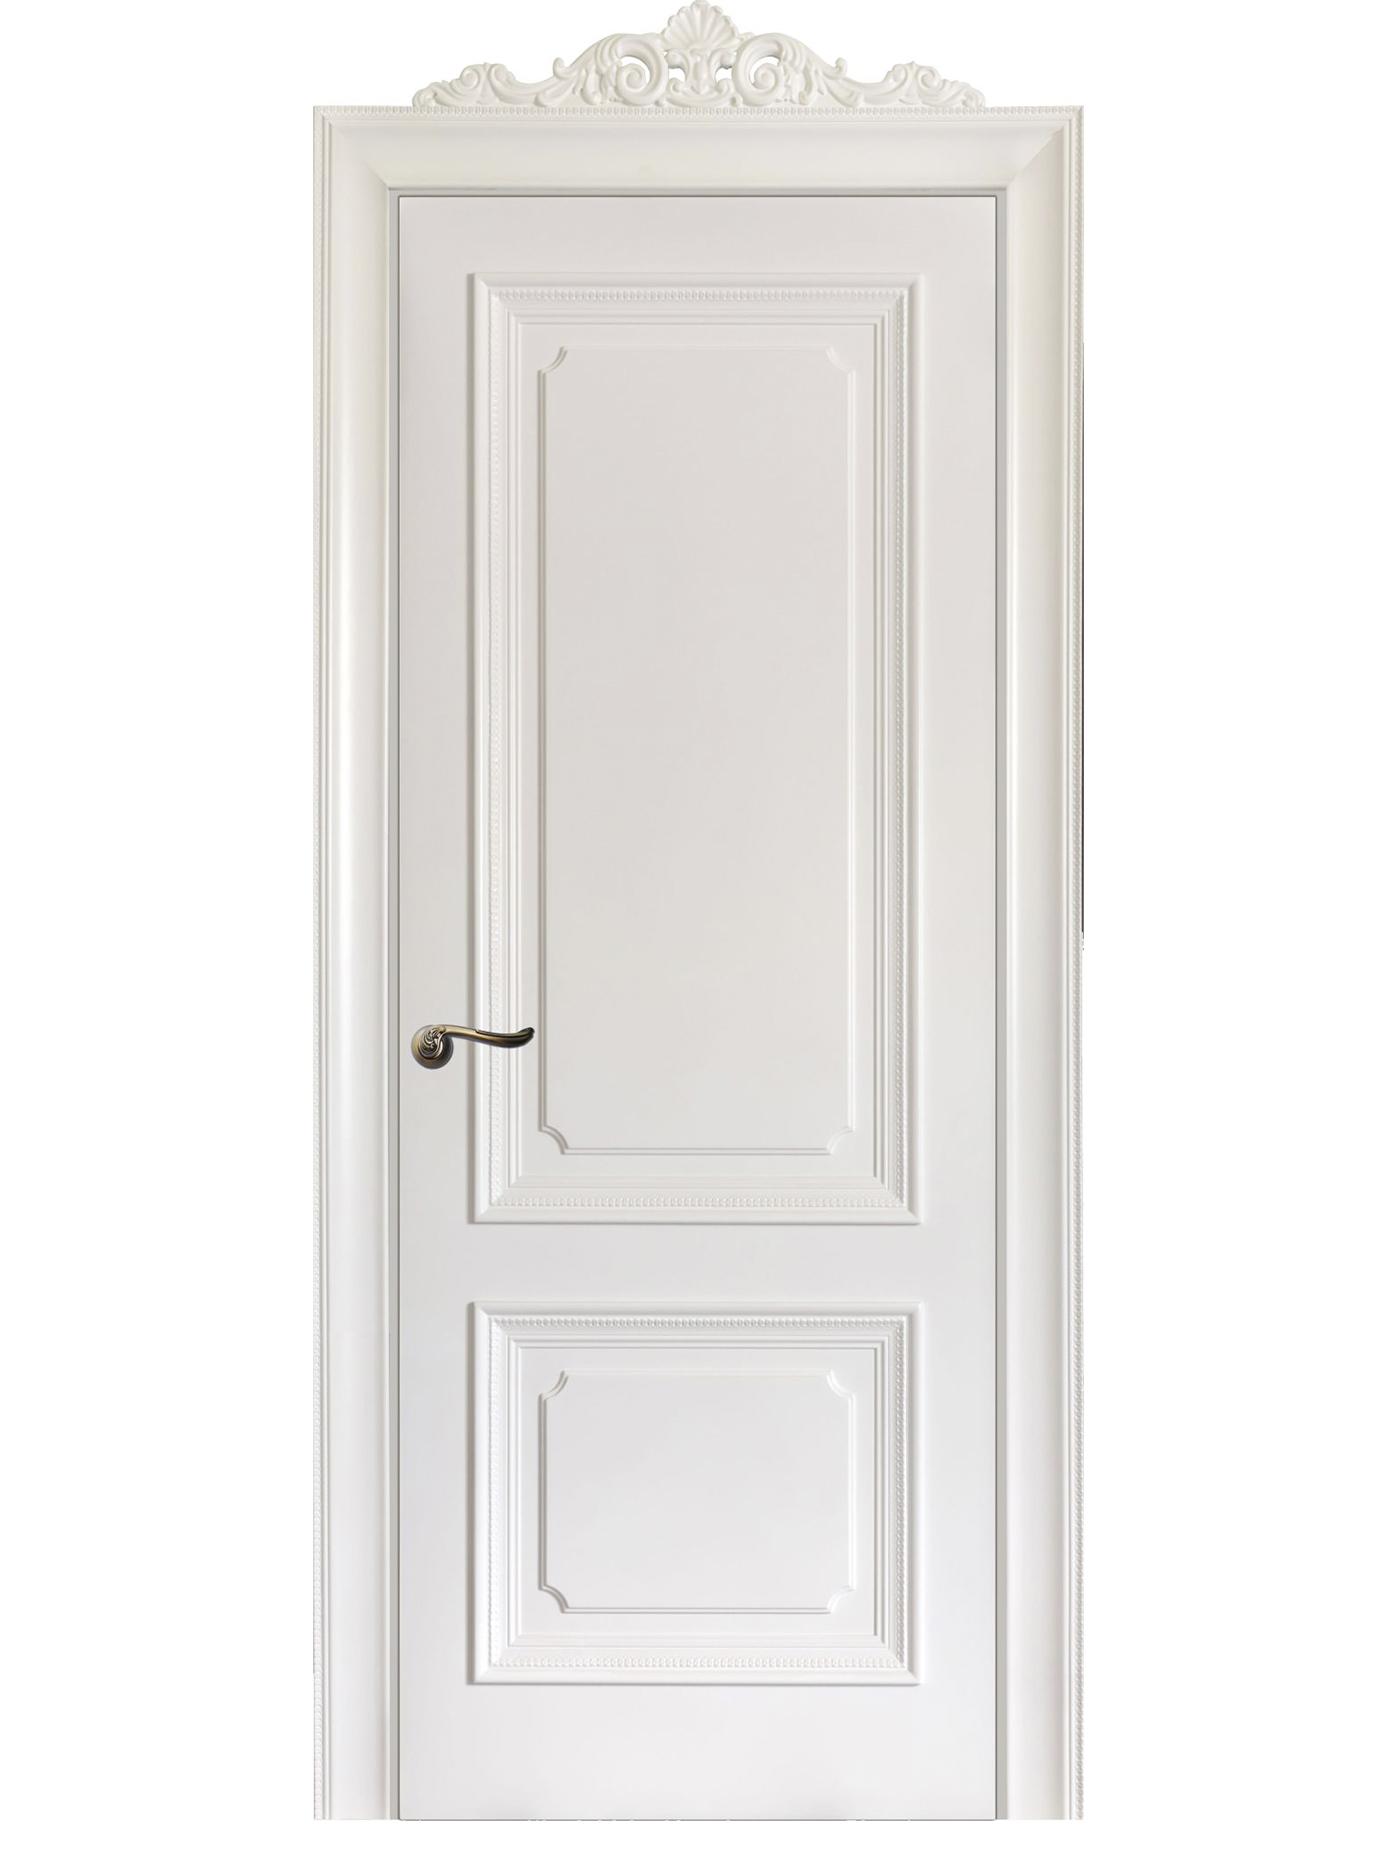 Image Floridia Interior Door Italian Enamel White 0